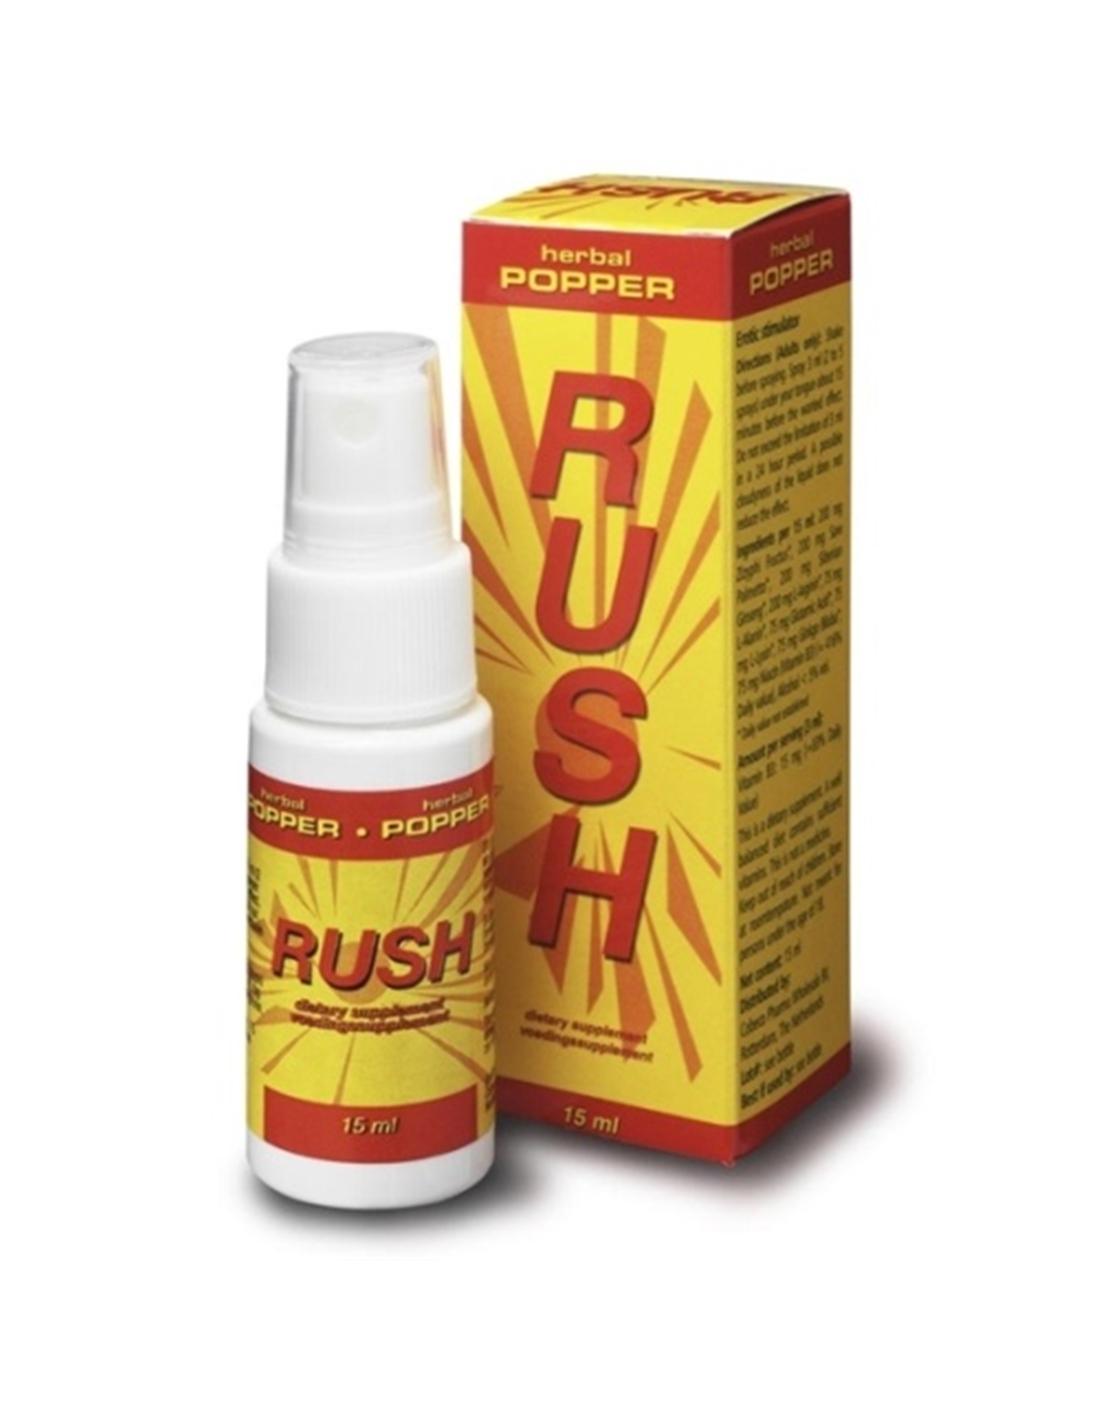 Spray Estimulante Rush Herbal Popper - 15ml - PR2010319714